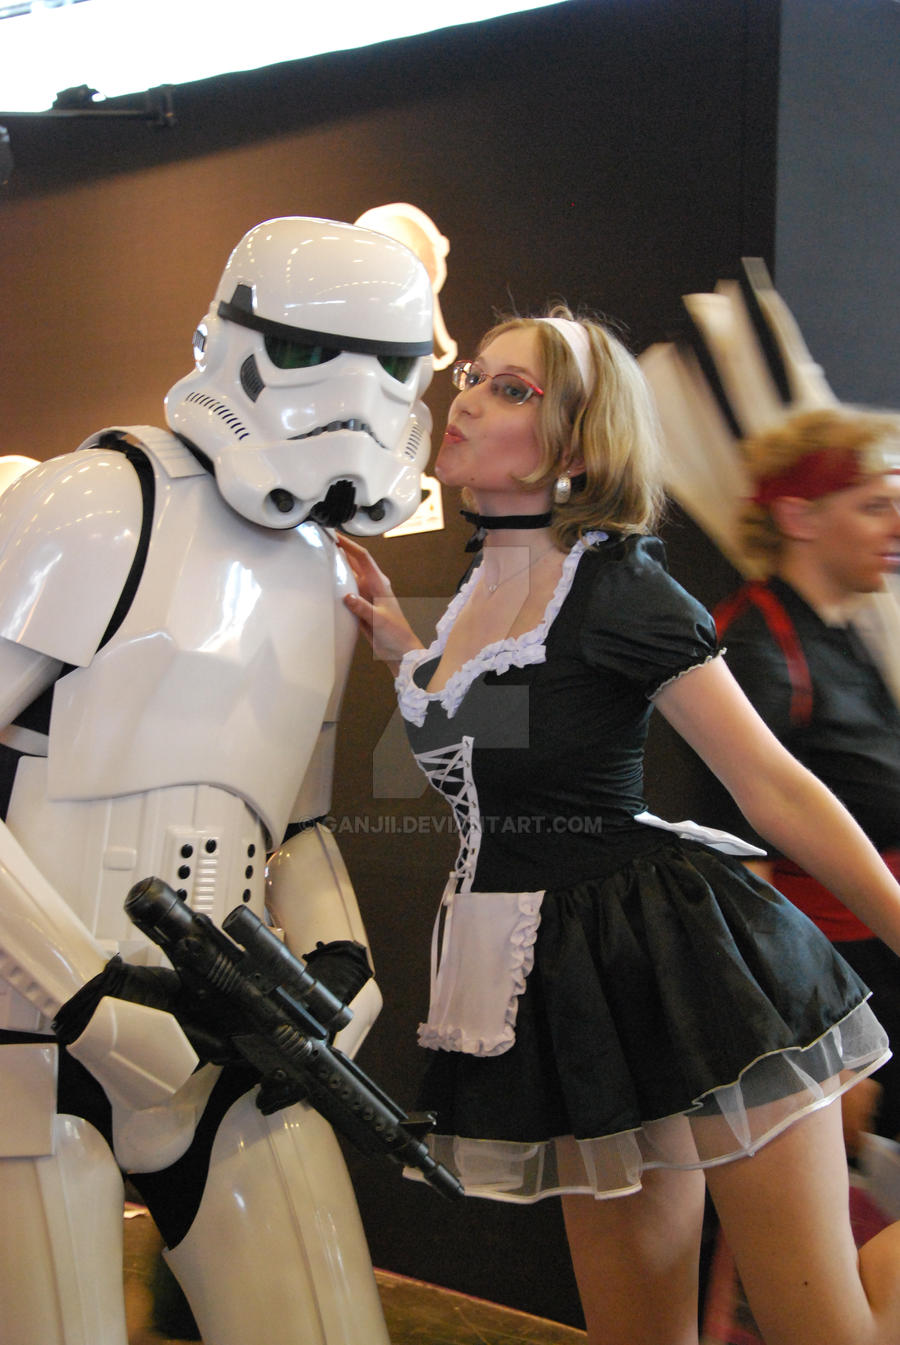 Maid vs Storm trooper